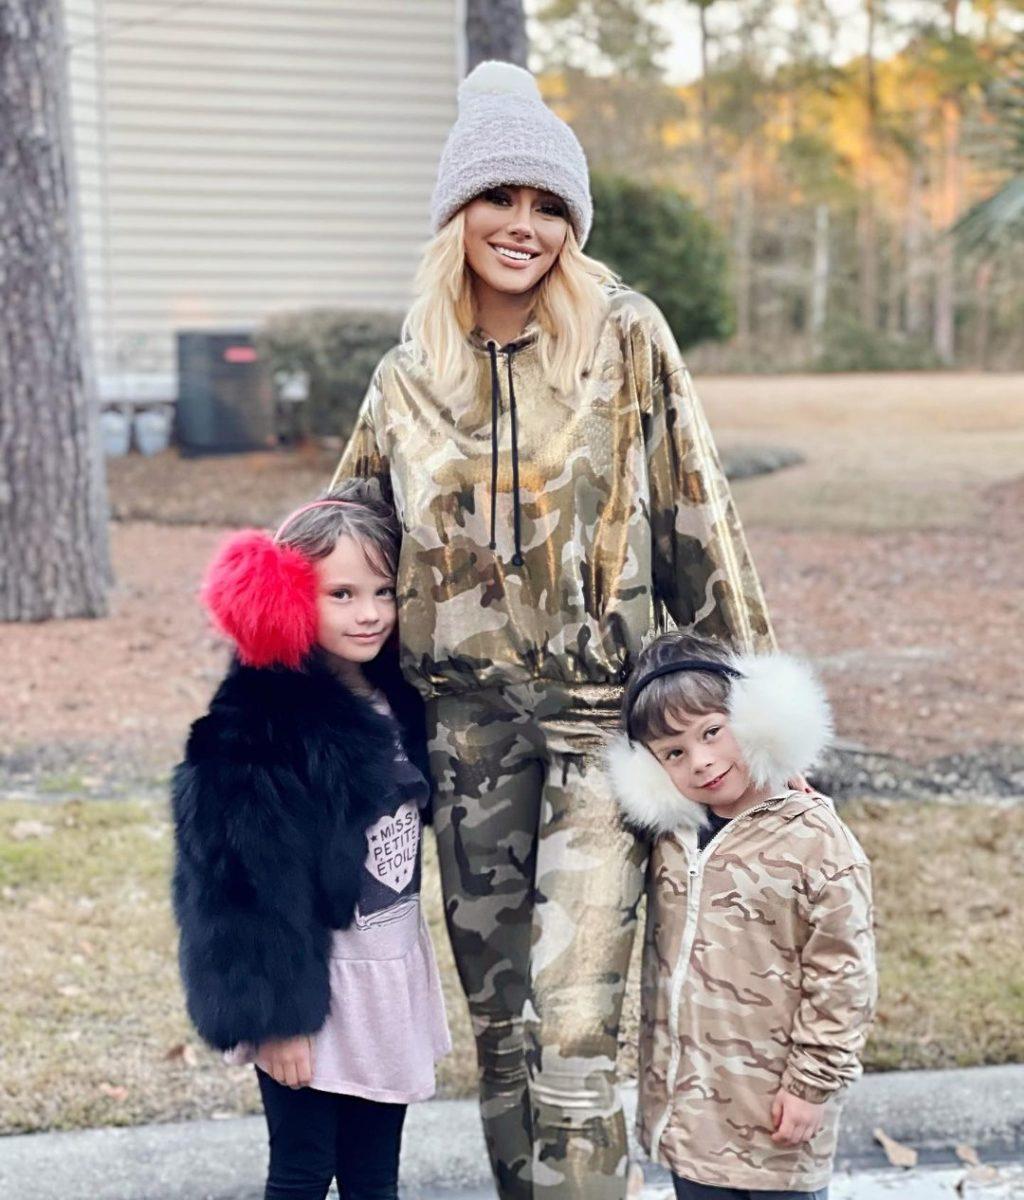 southern charm's kathryn dennis loses custody of children to ex thomas ravenel